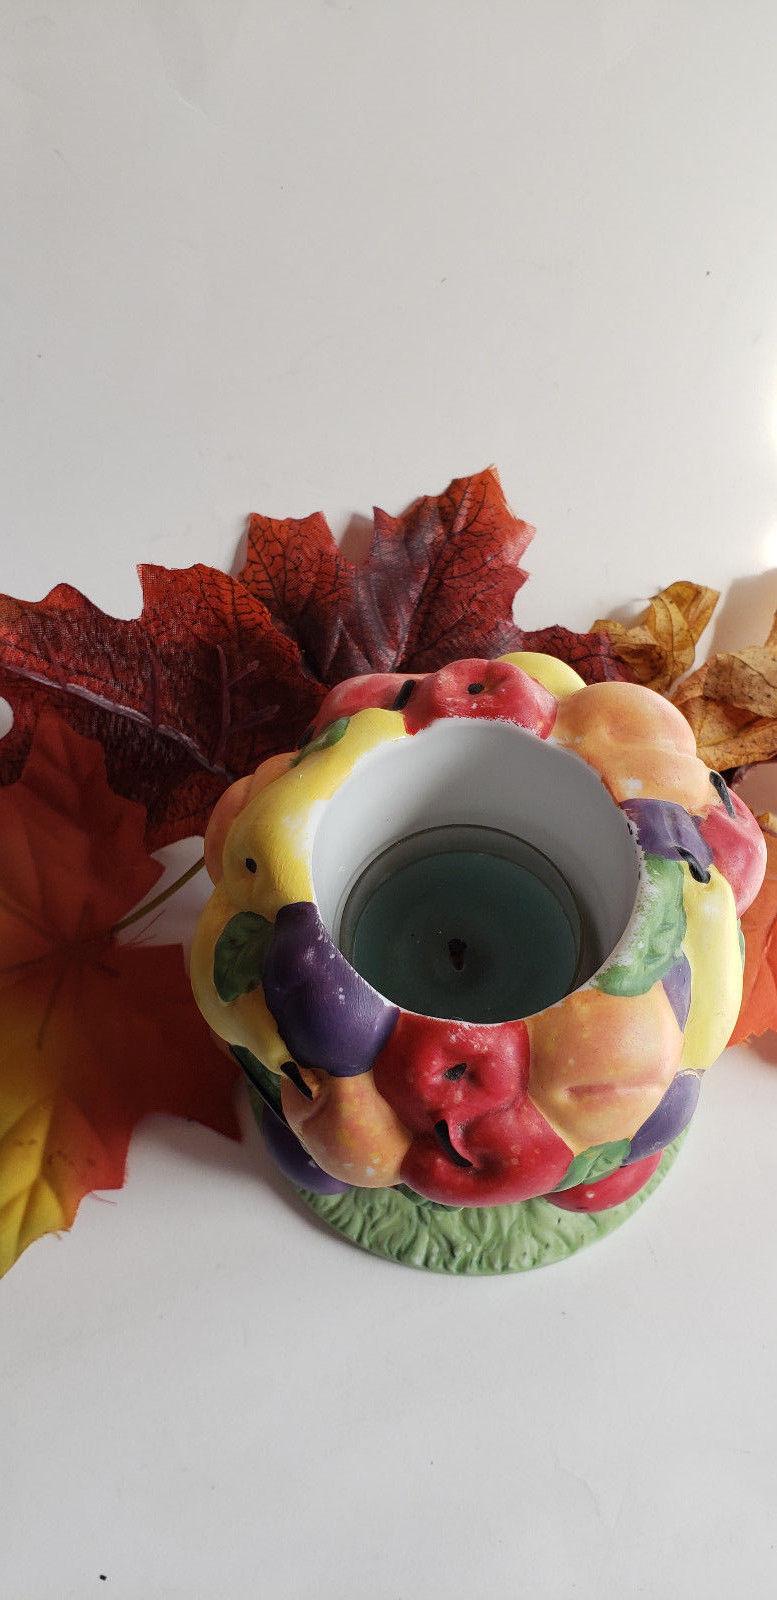 PartyLite Fruit Medley Votive Tealight Holder Fall Autumn Basket Decoration